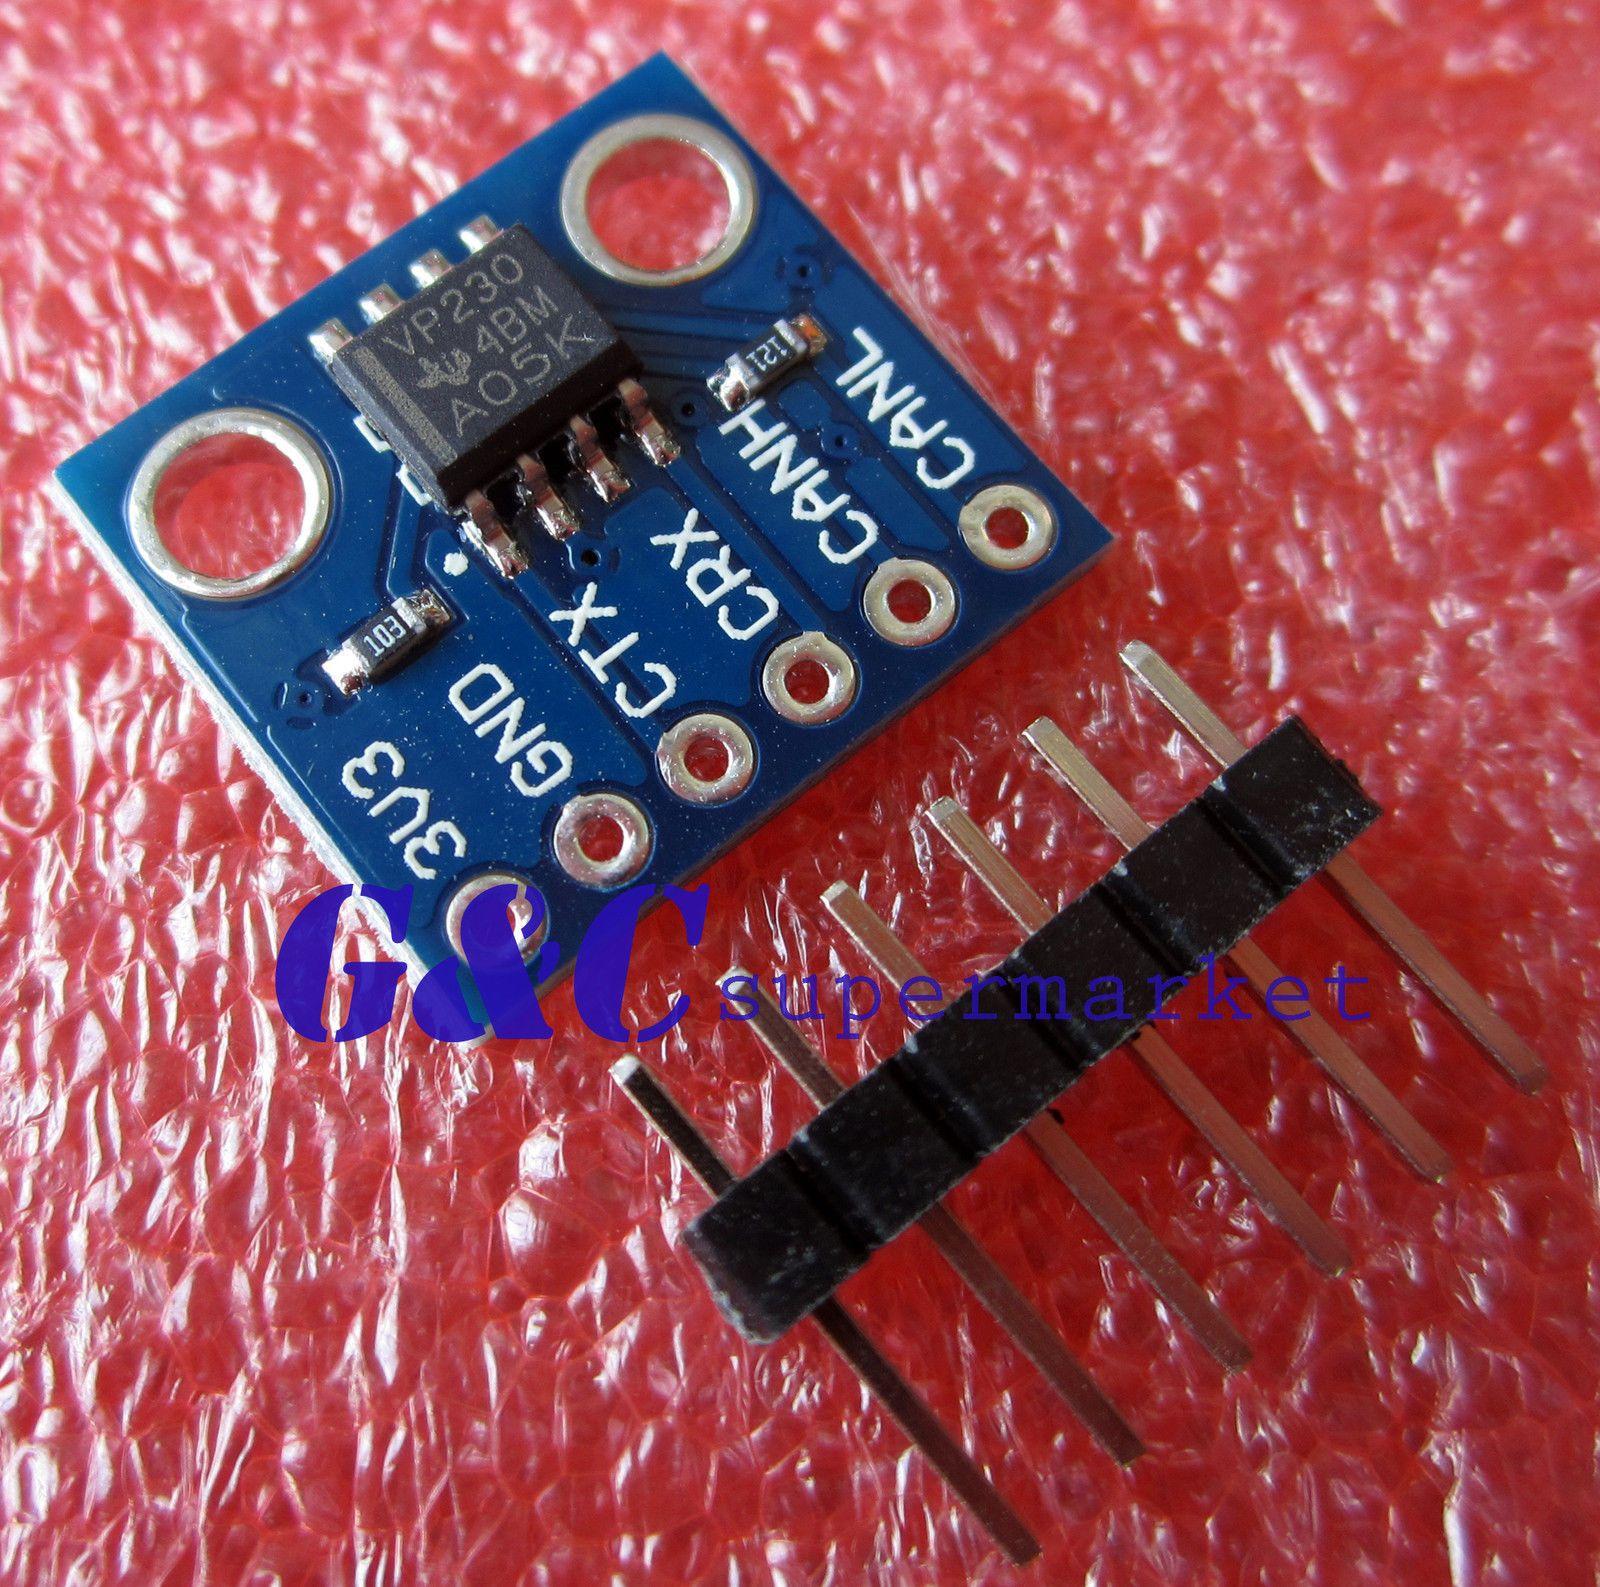 $5 88 - 2Pcs Sn65Hvd230 Can Bus Transceiver Communication Module